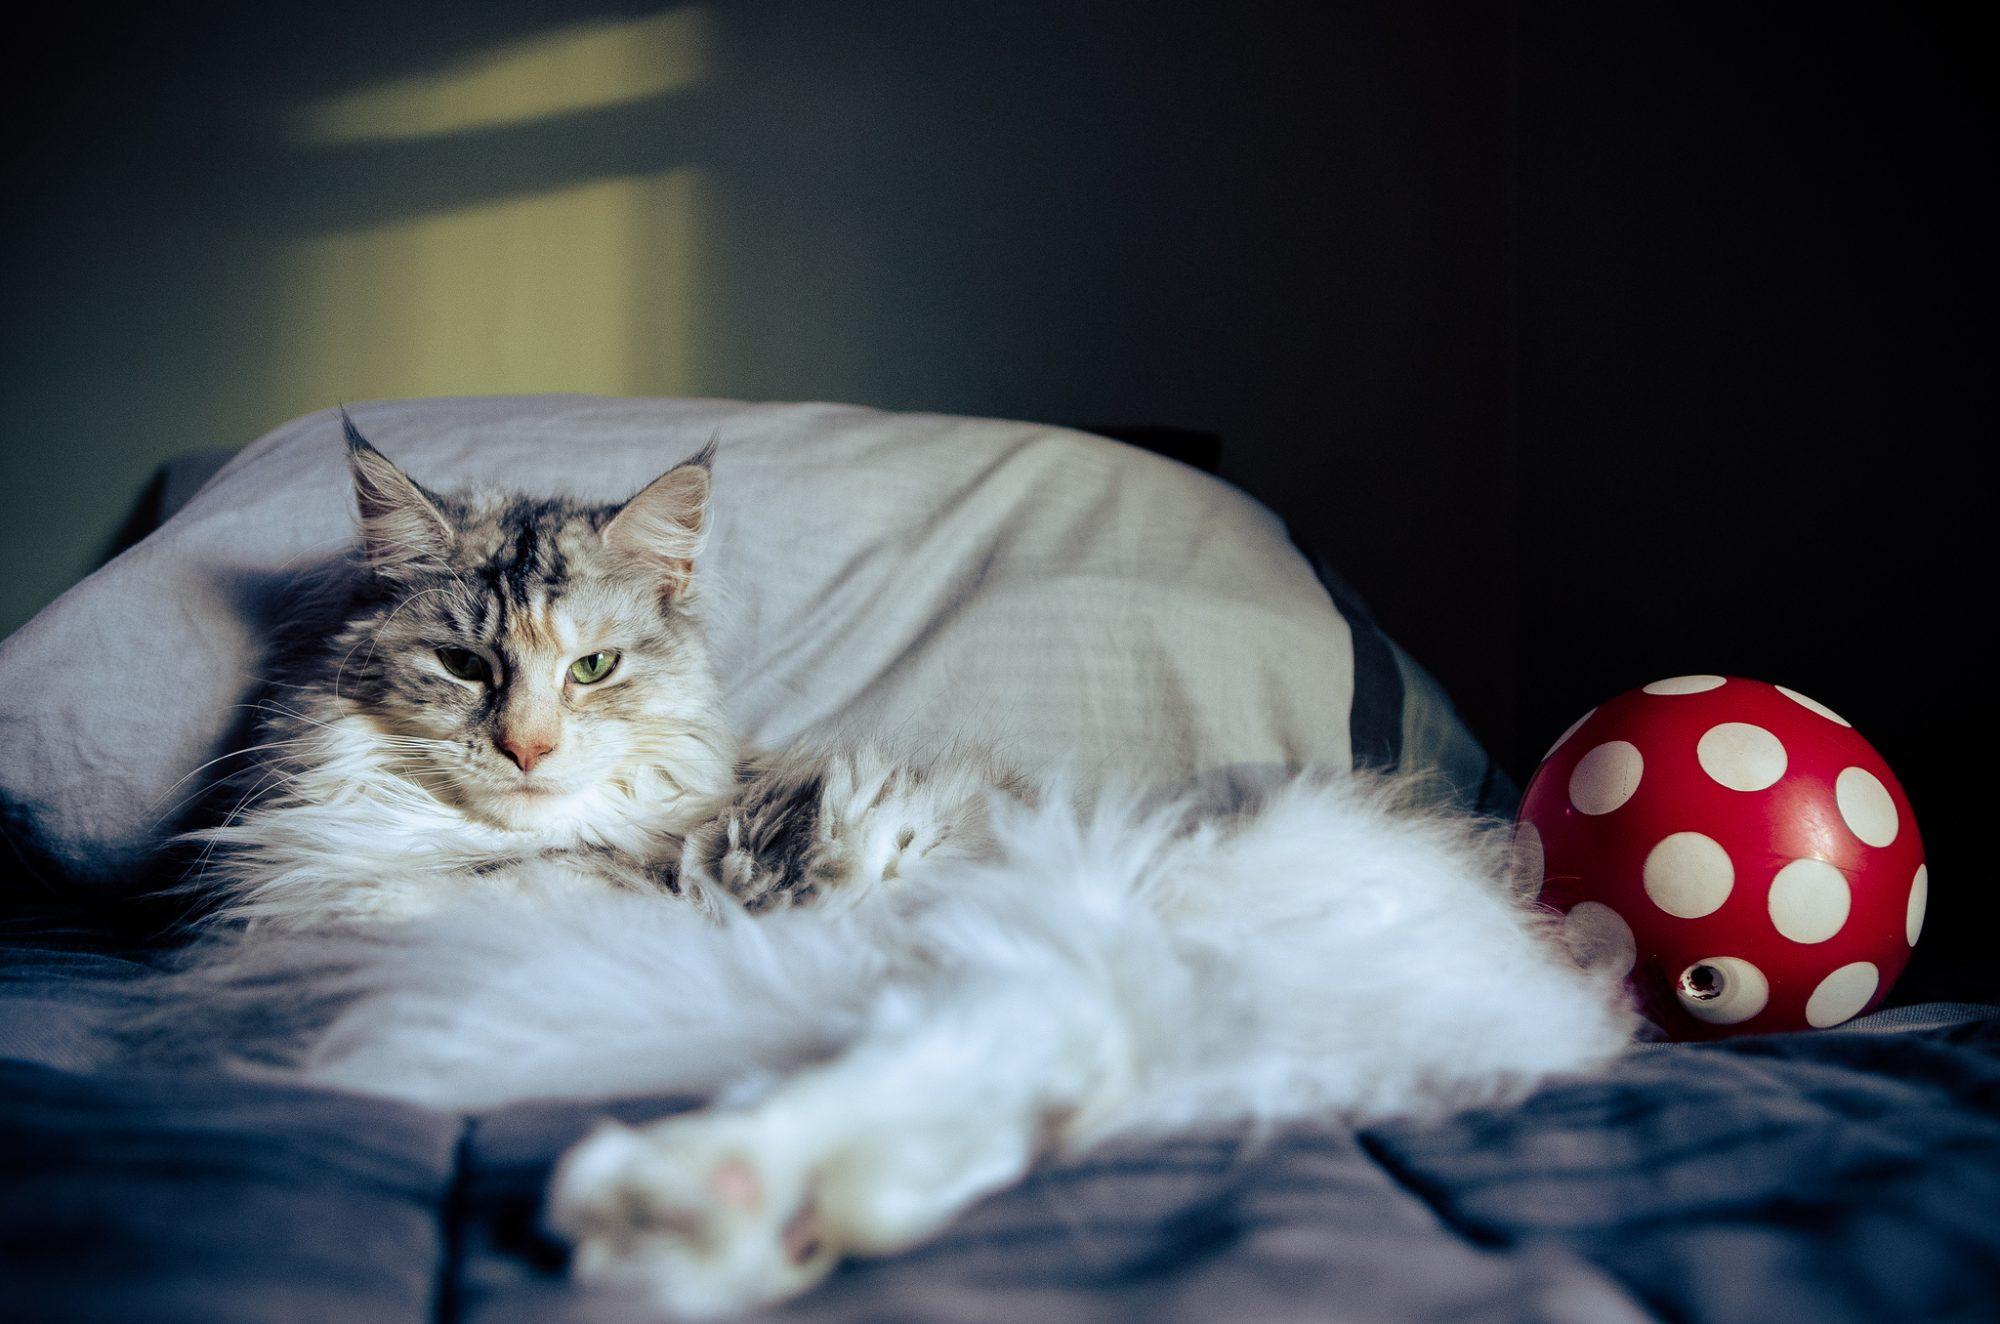 Petective, l'appli qui te permet de retrouver ton chat